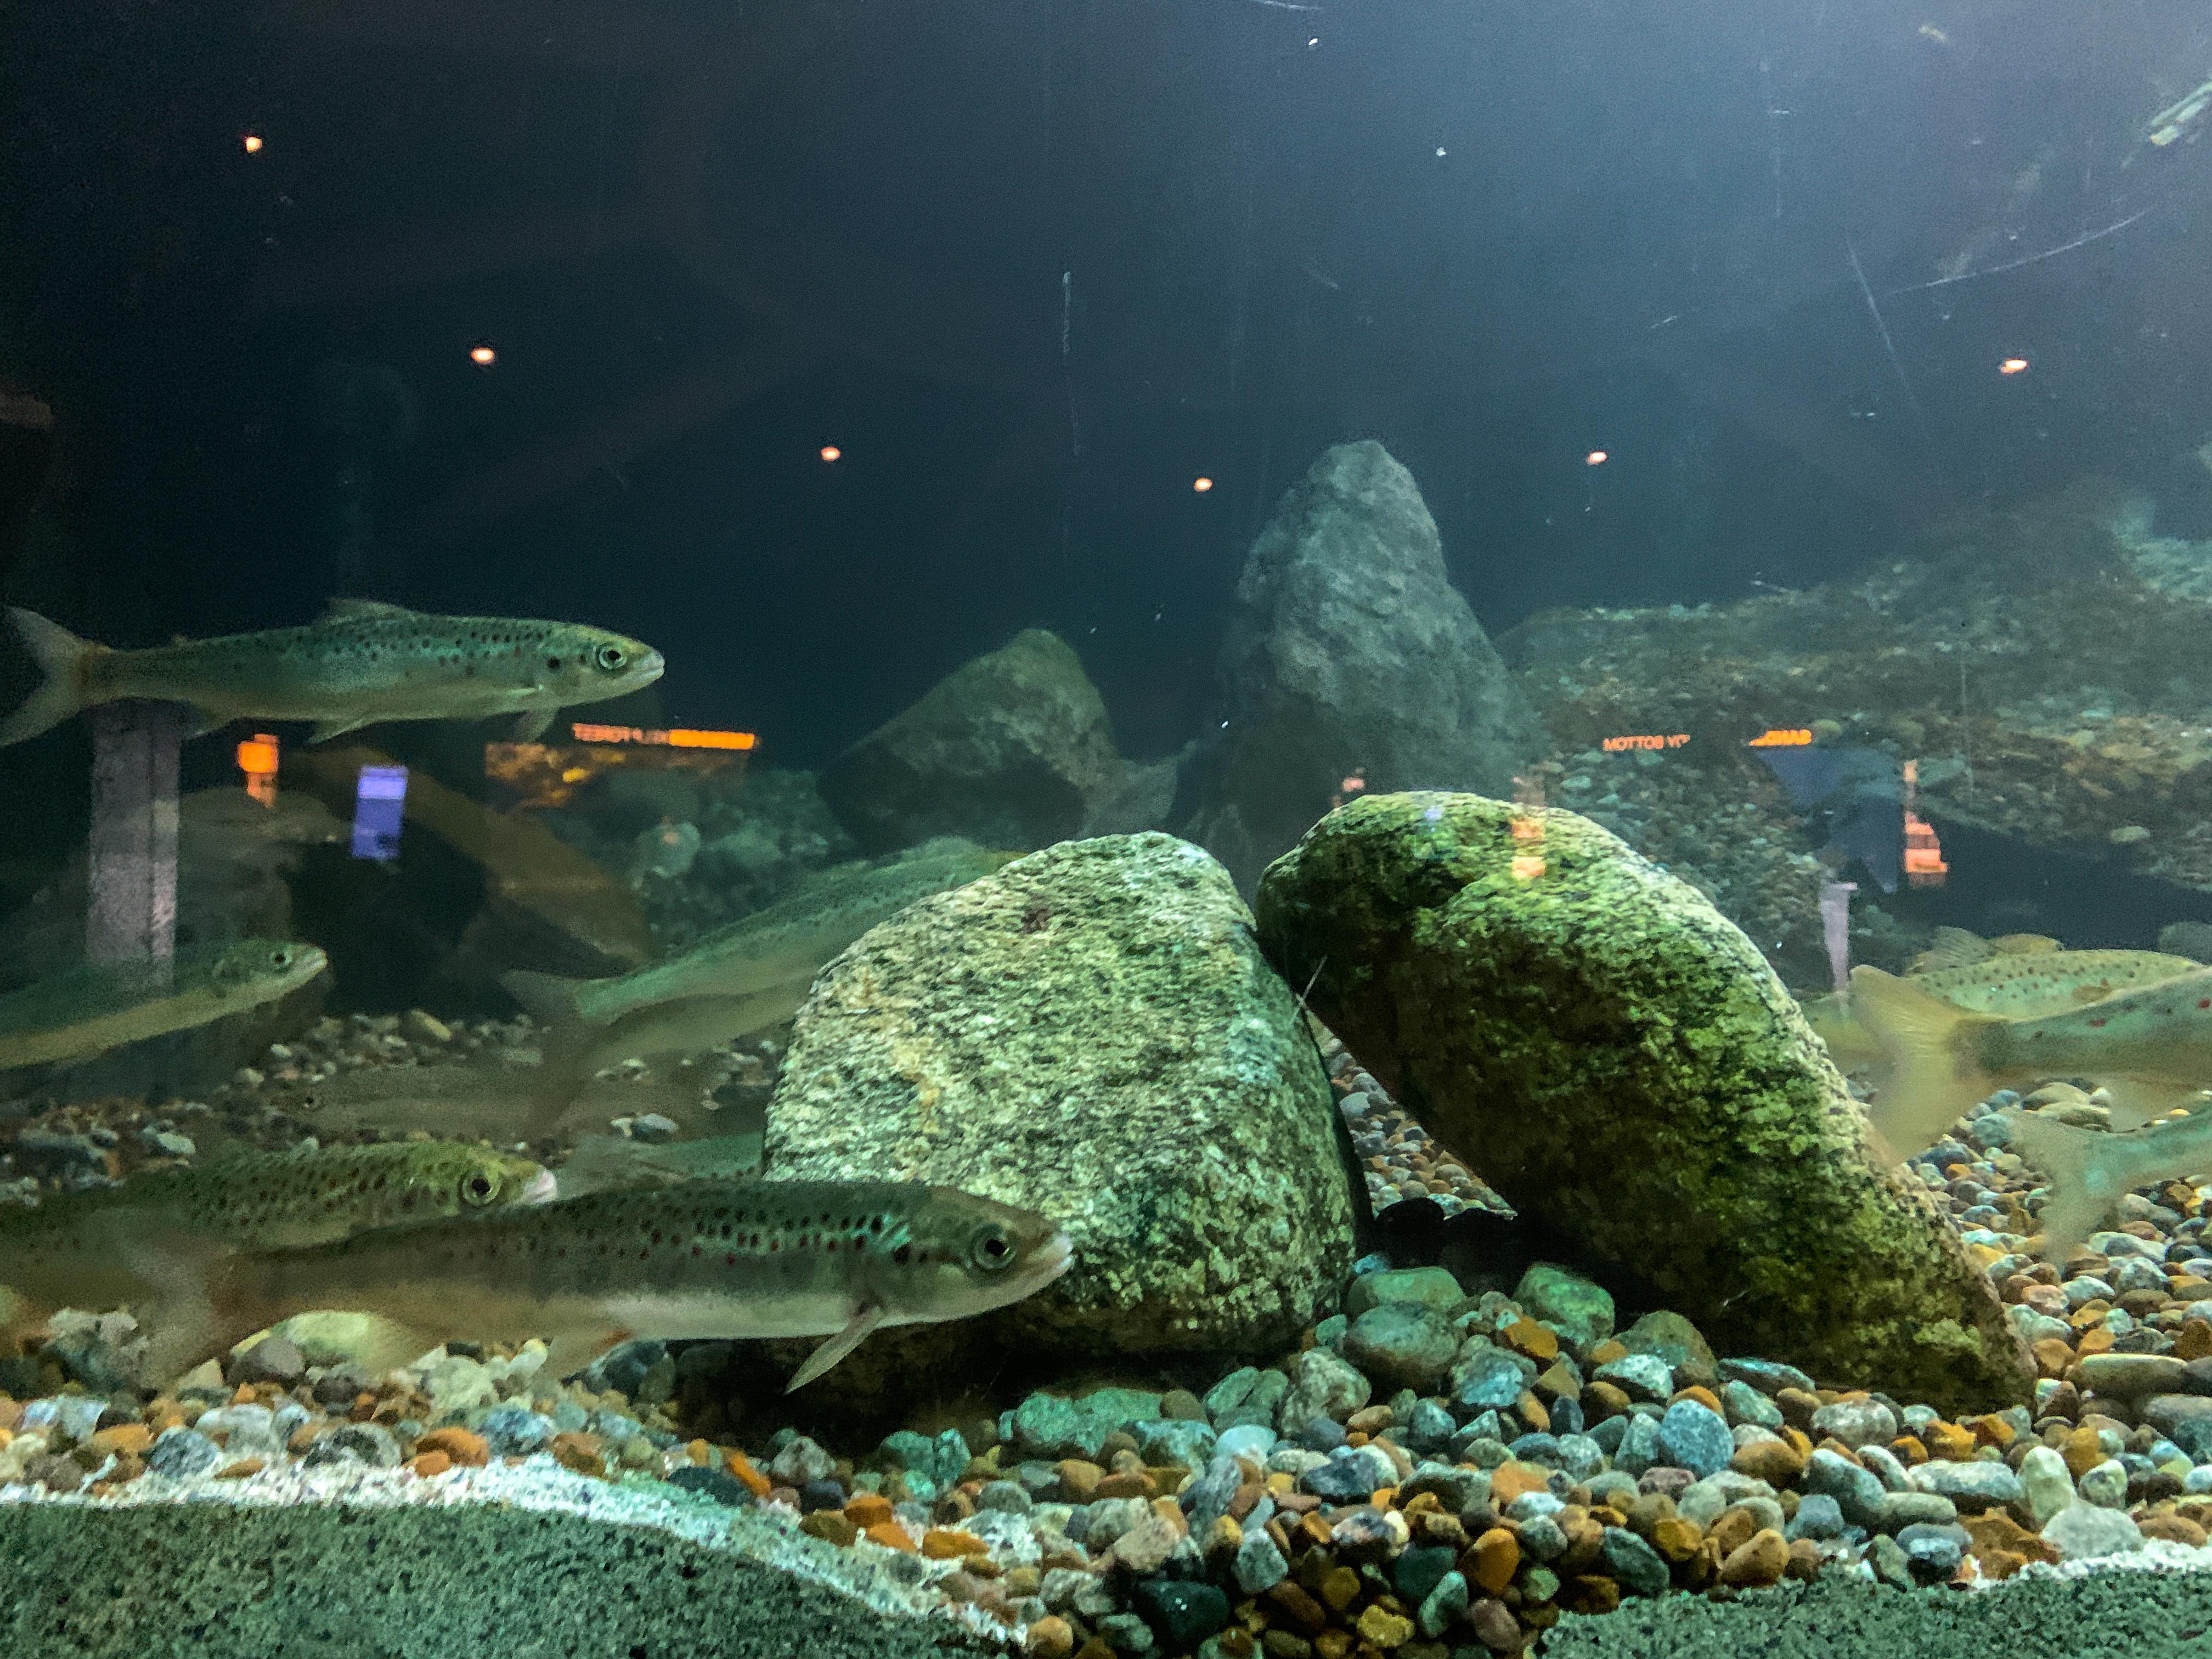 Fisk svømmer mot stein